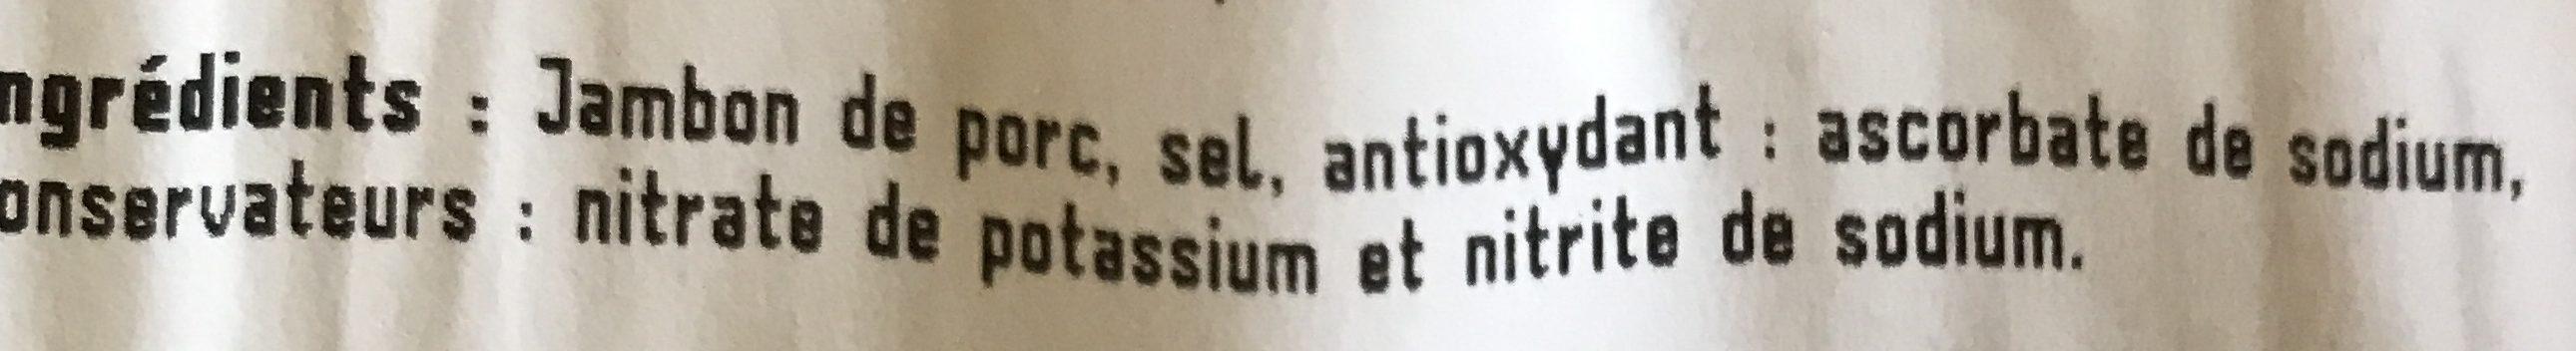 Fines tranches de jambon cru Serrano 11 mois d'âge - Ingredientes